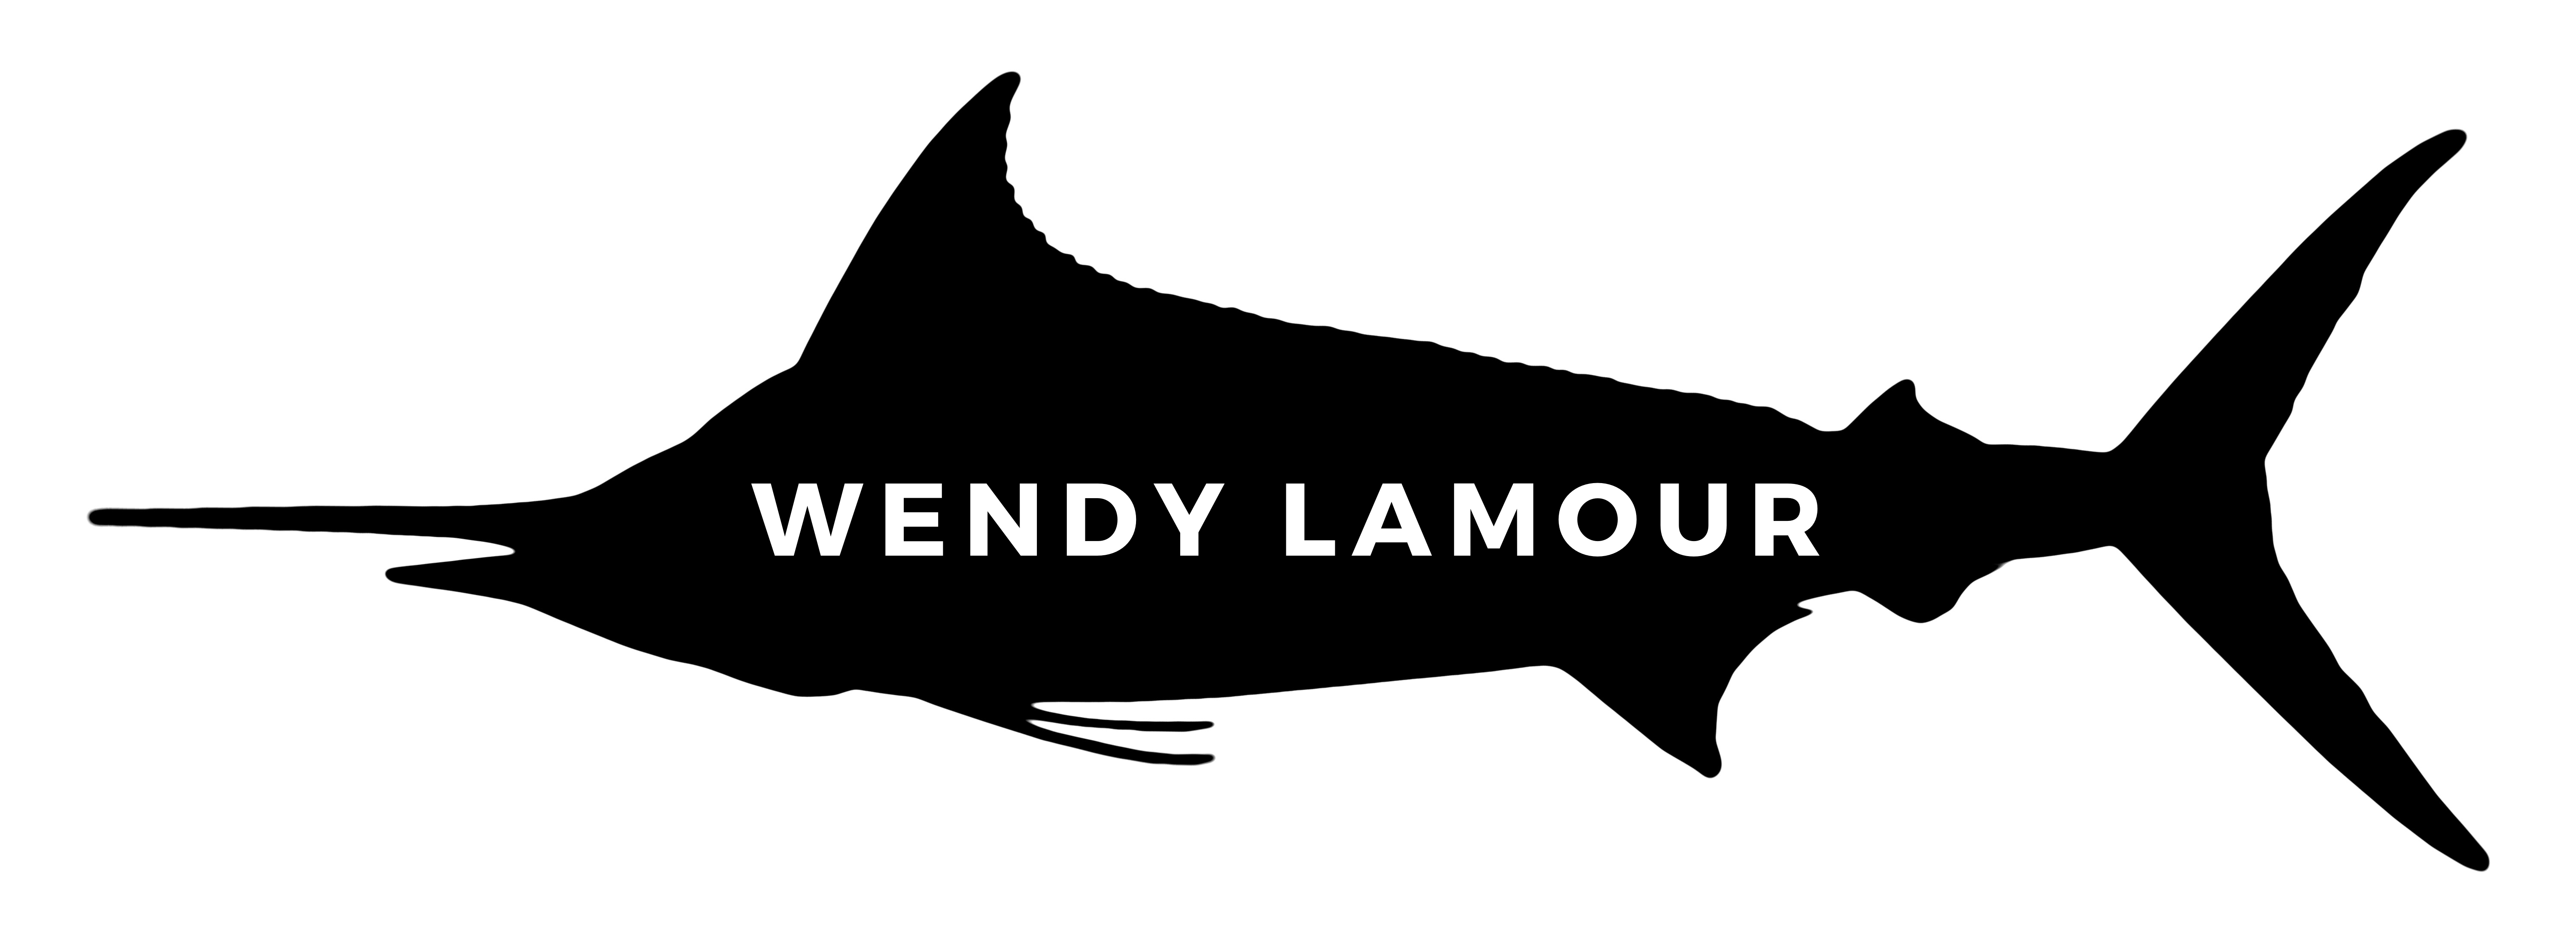 wendy-lamour-logo.png